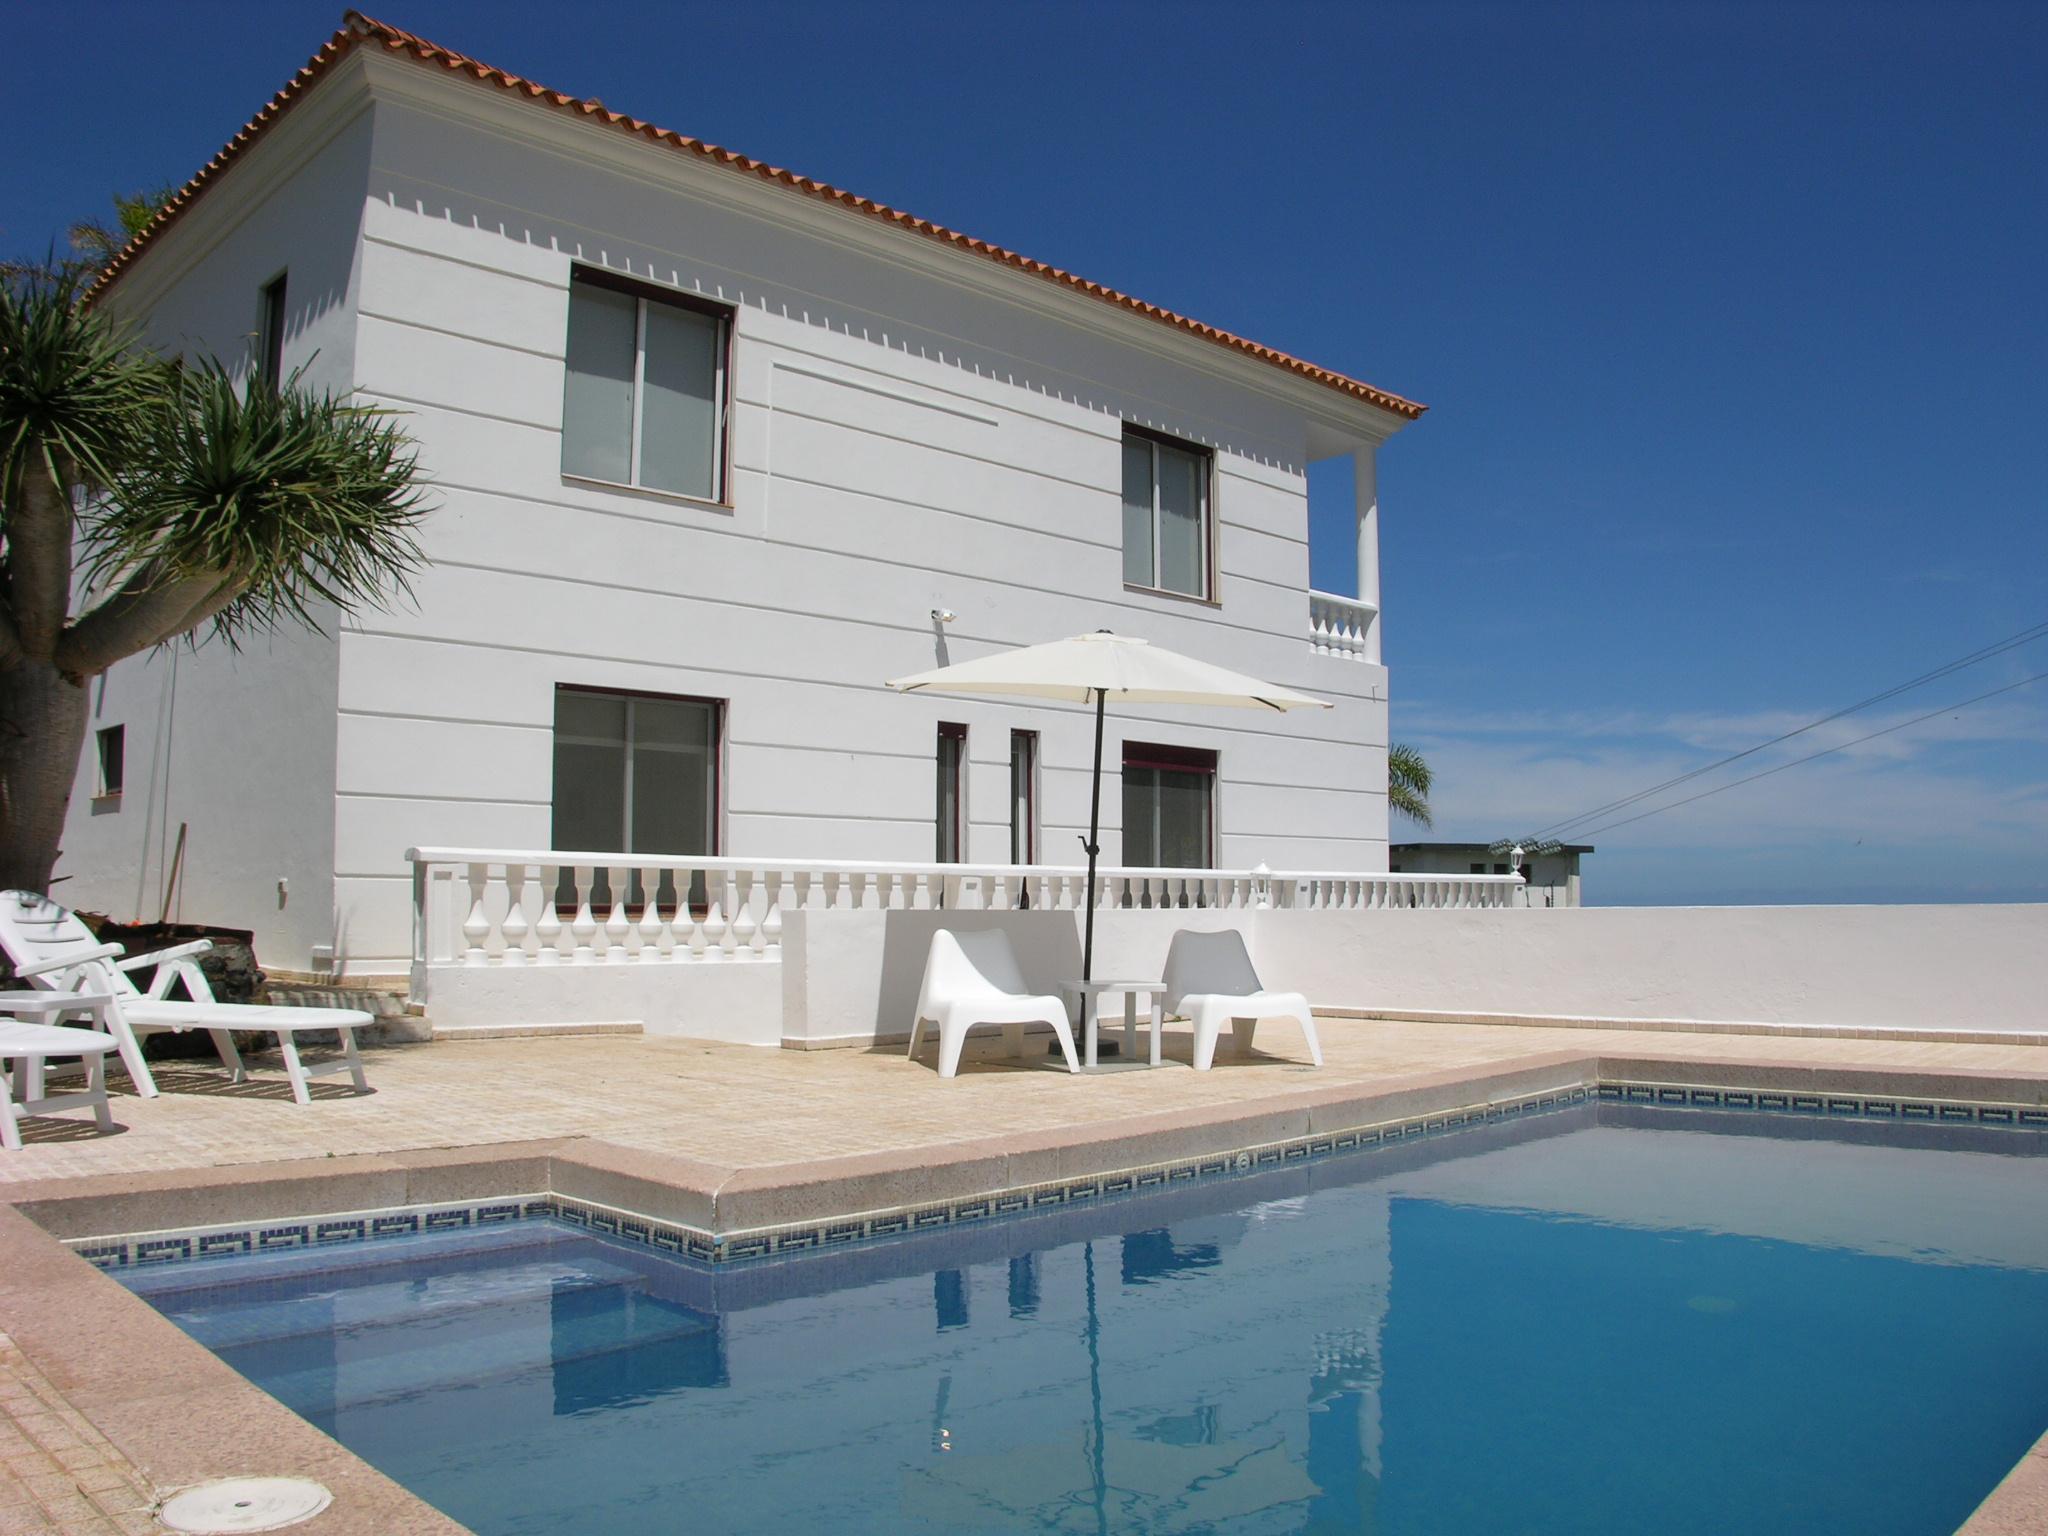 Maison de vacances Villa Vista La Quinta beheizbarer Pool kostenloses WLAN Grill (2124407), Santa Ursula, Ténérife, Iles Canaries, Espagne, image 51